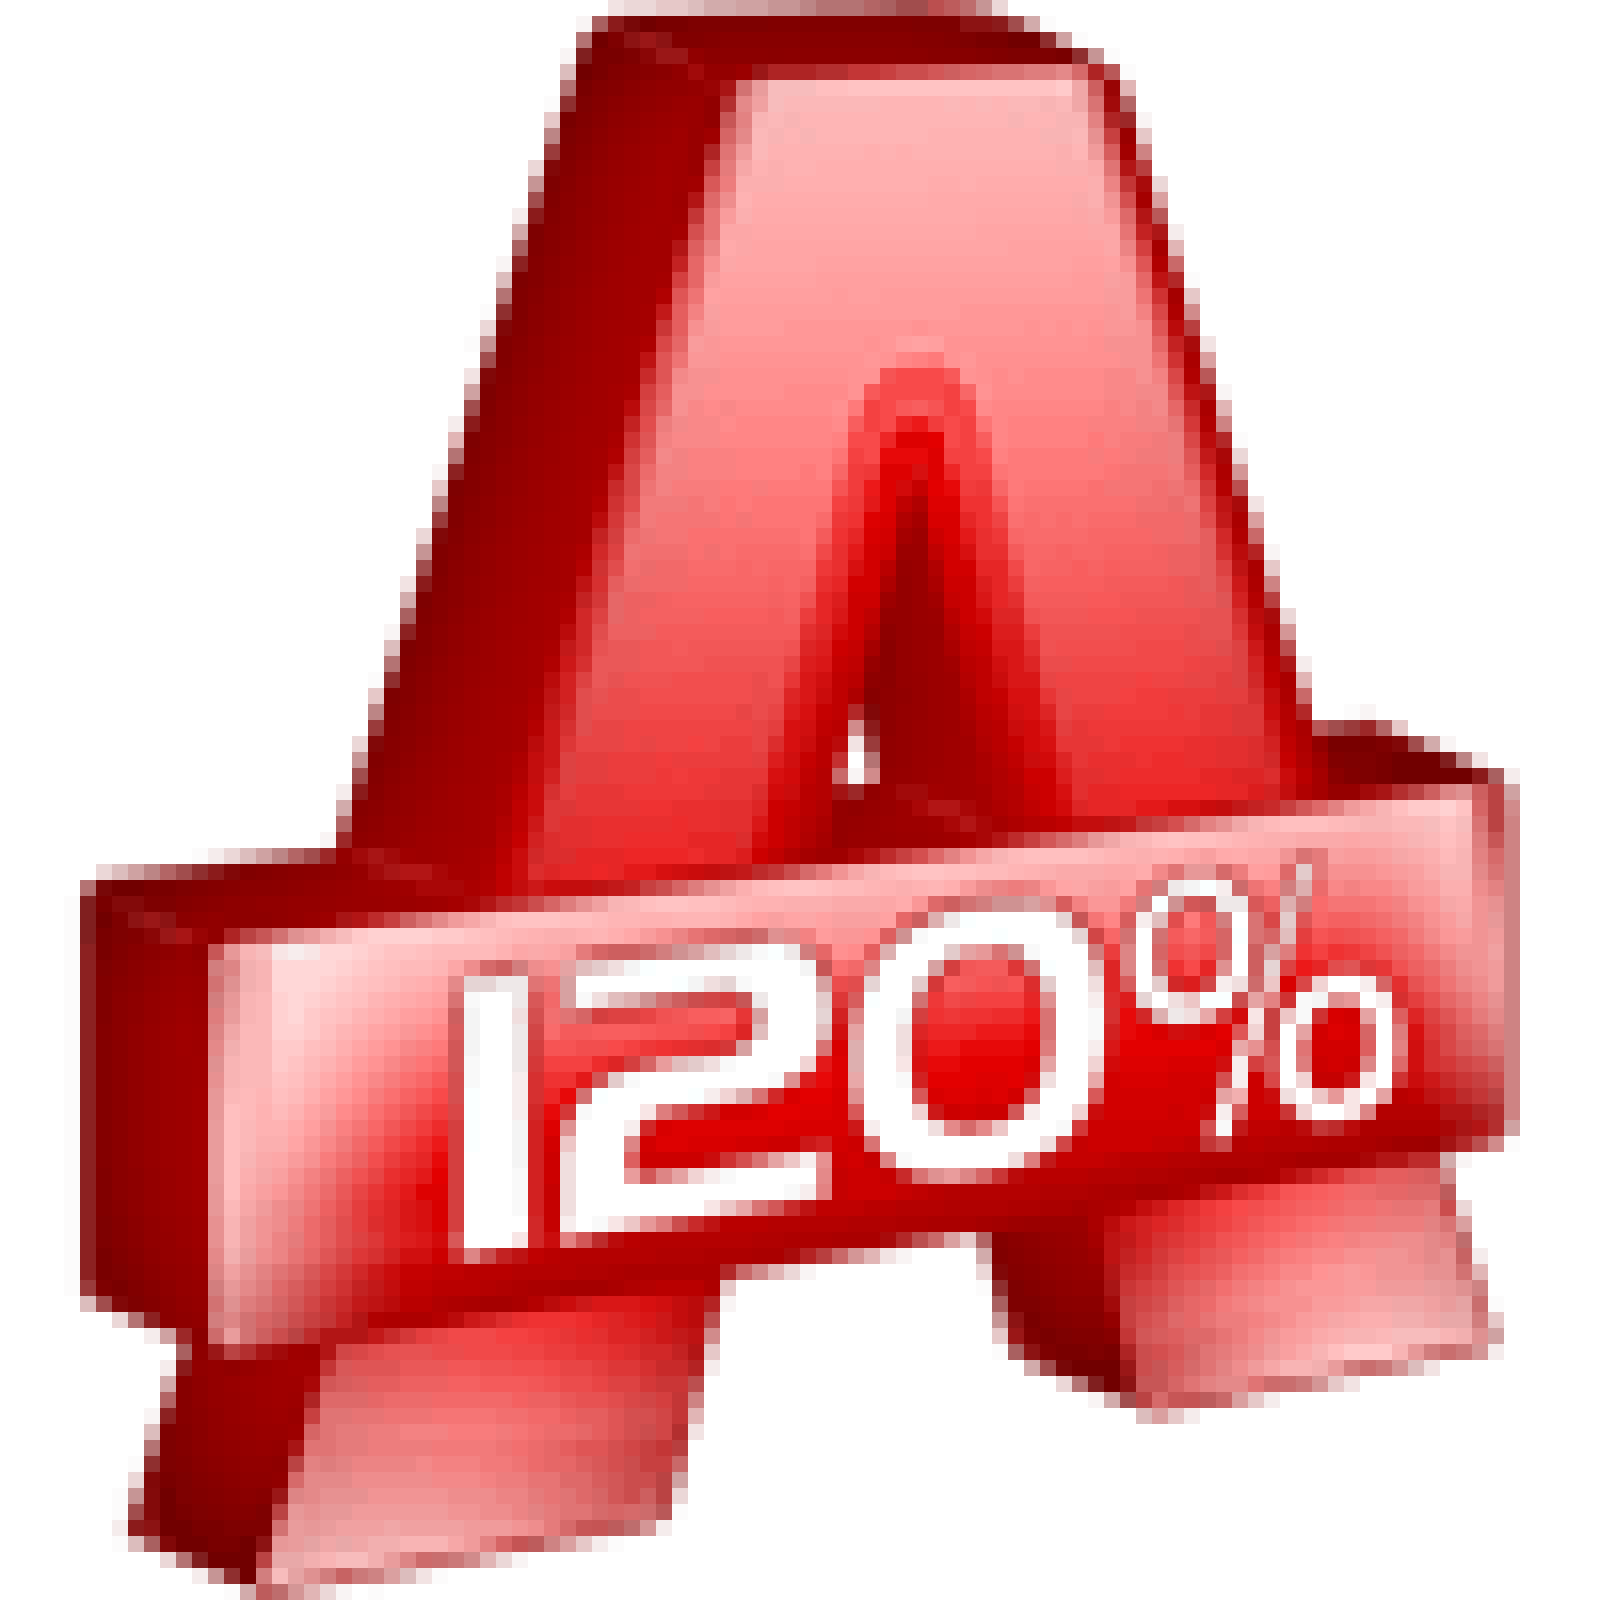 Alcohol 120% BluRay